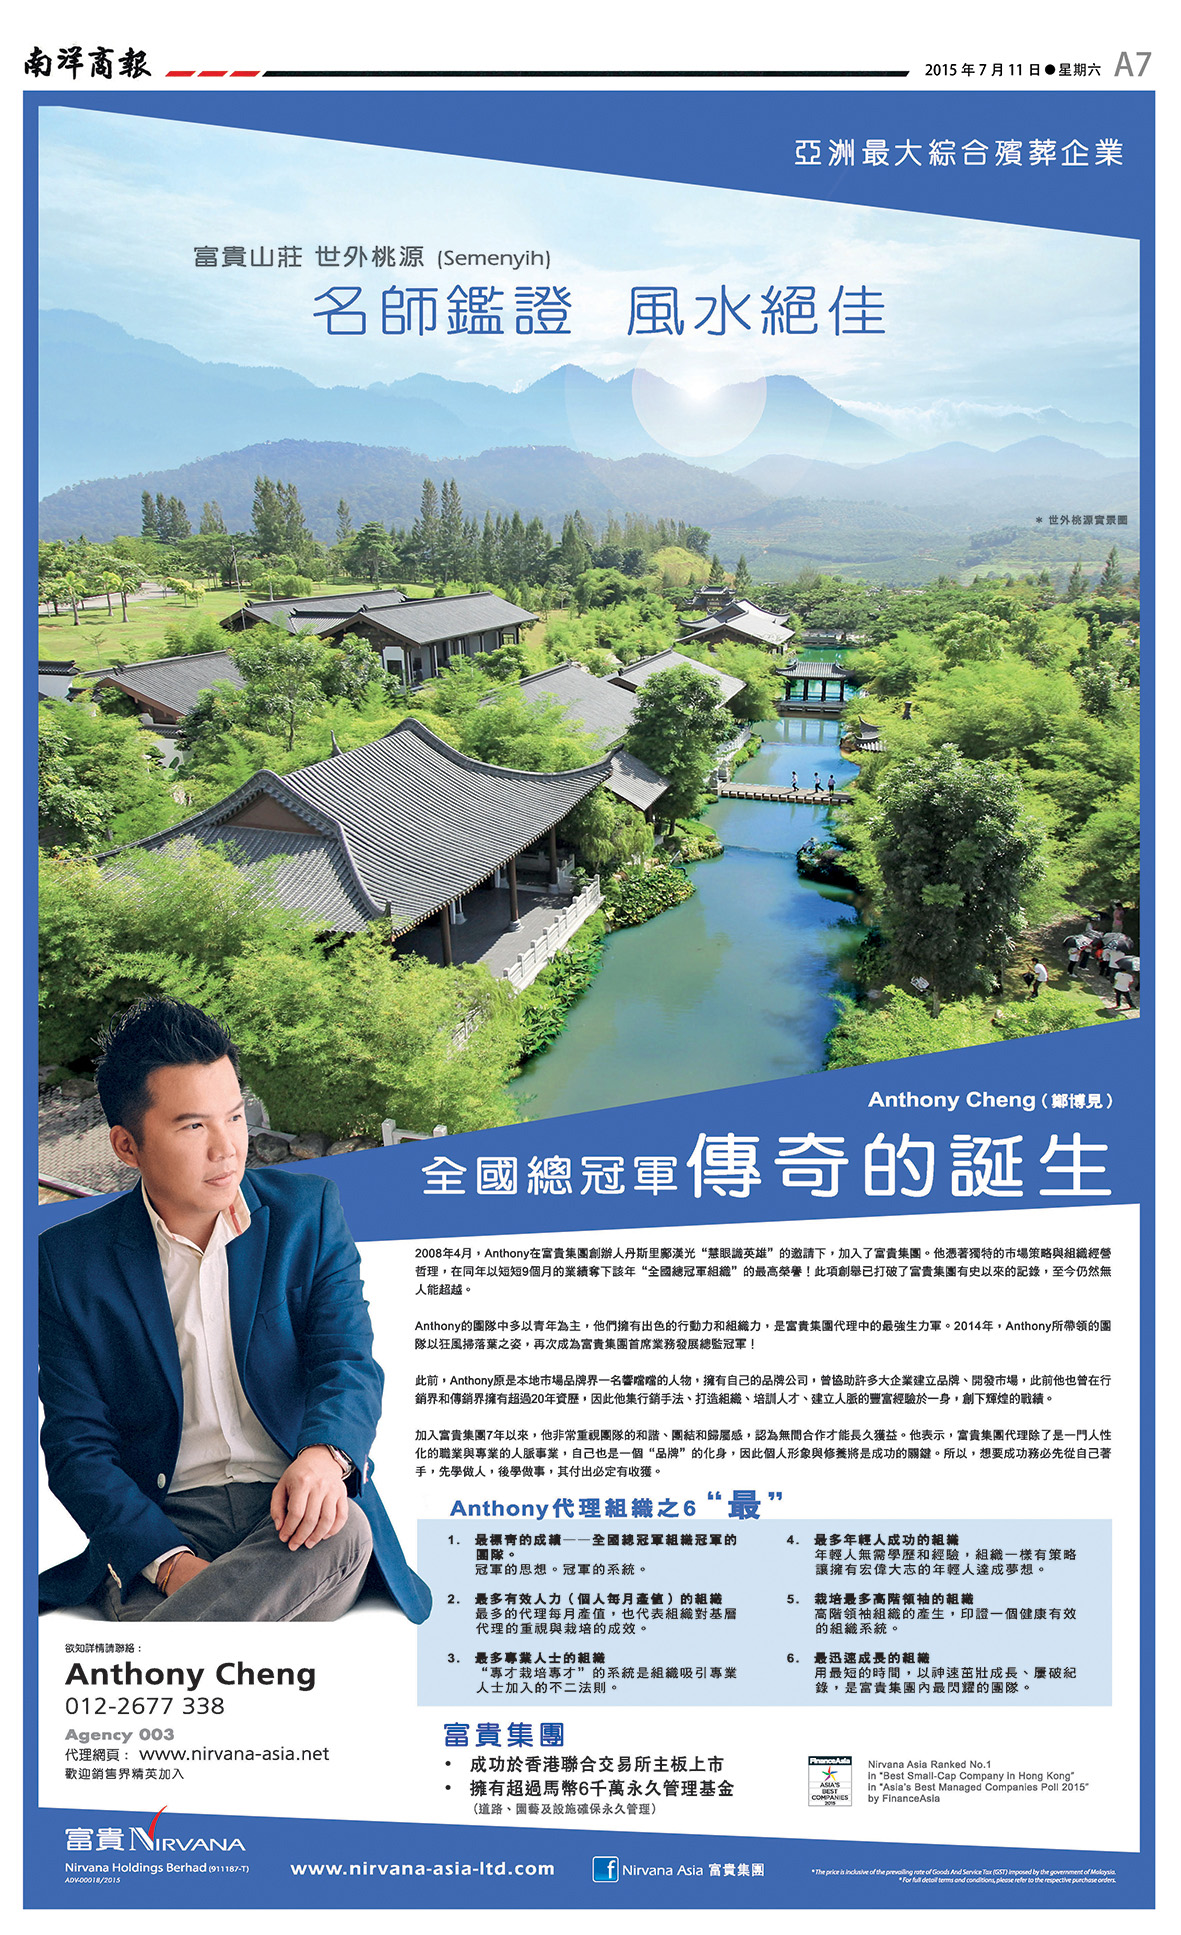 南洋商报专访 NanYang article